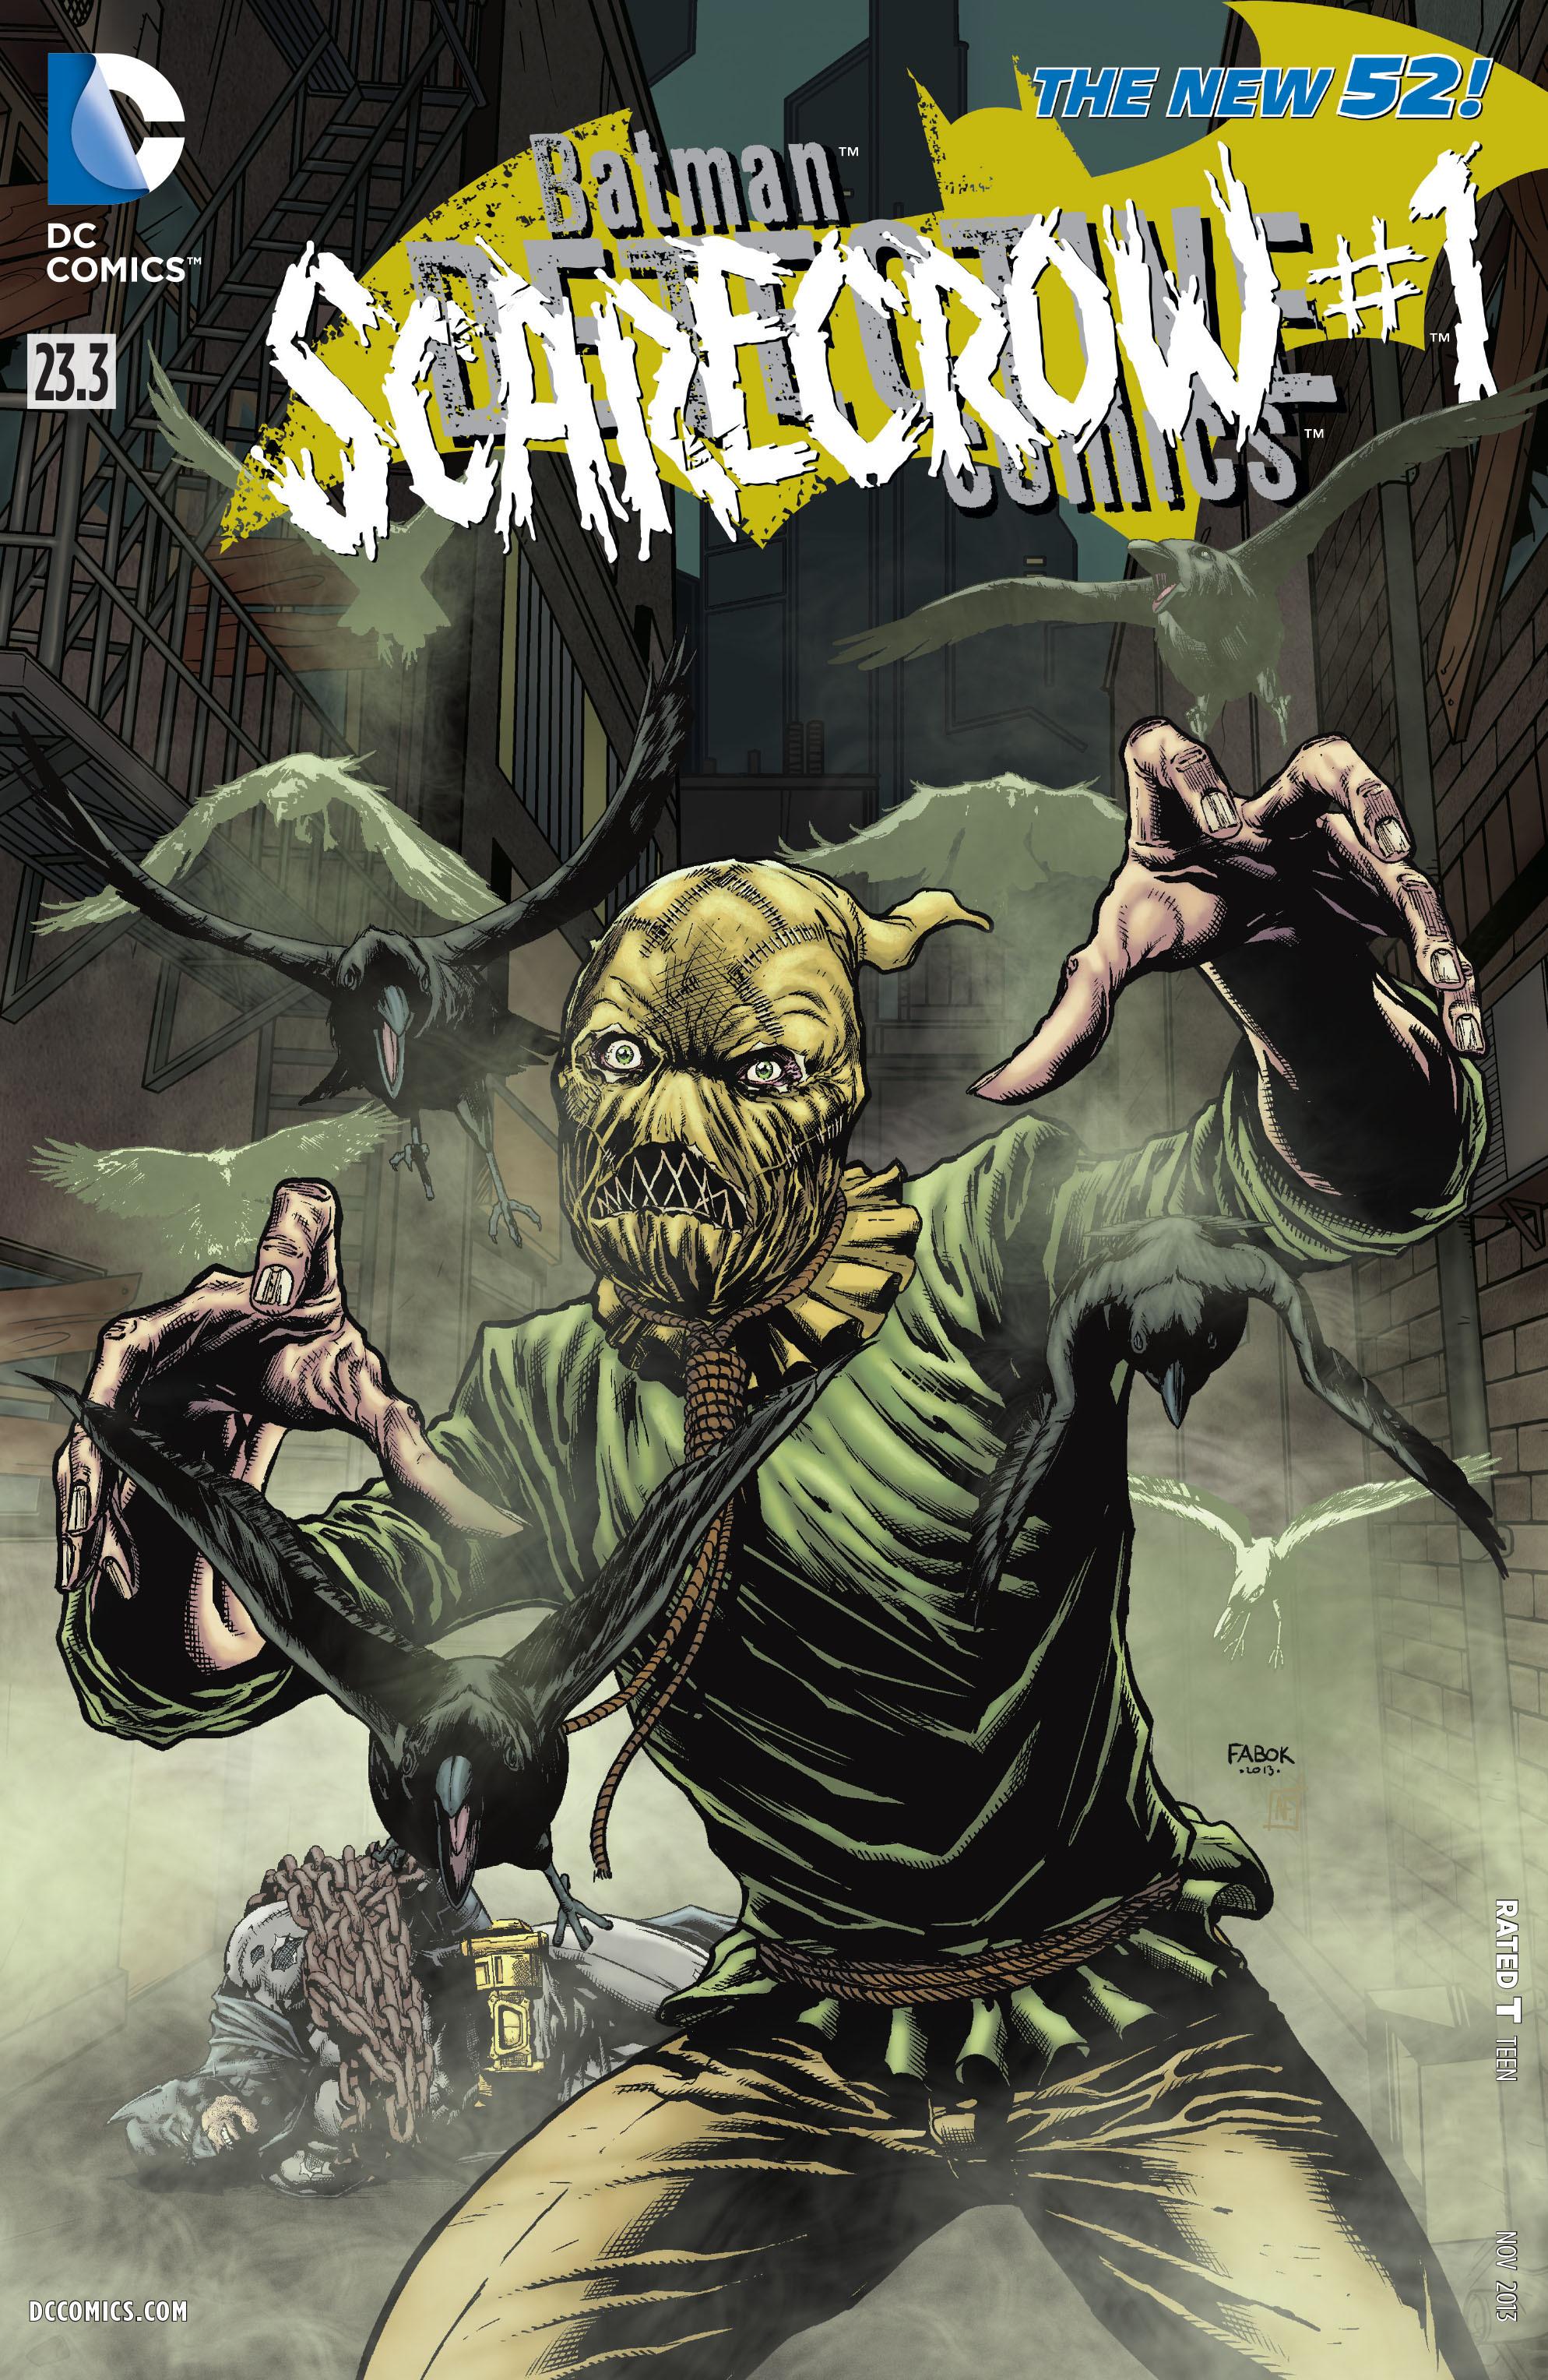 Detective Comics (2011) 23.3 Page 1